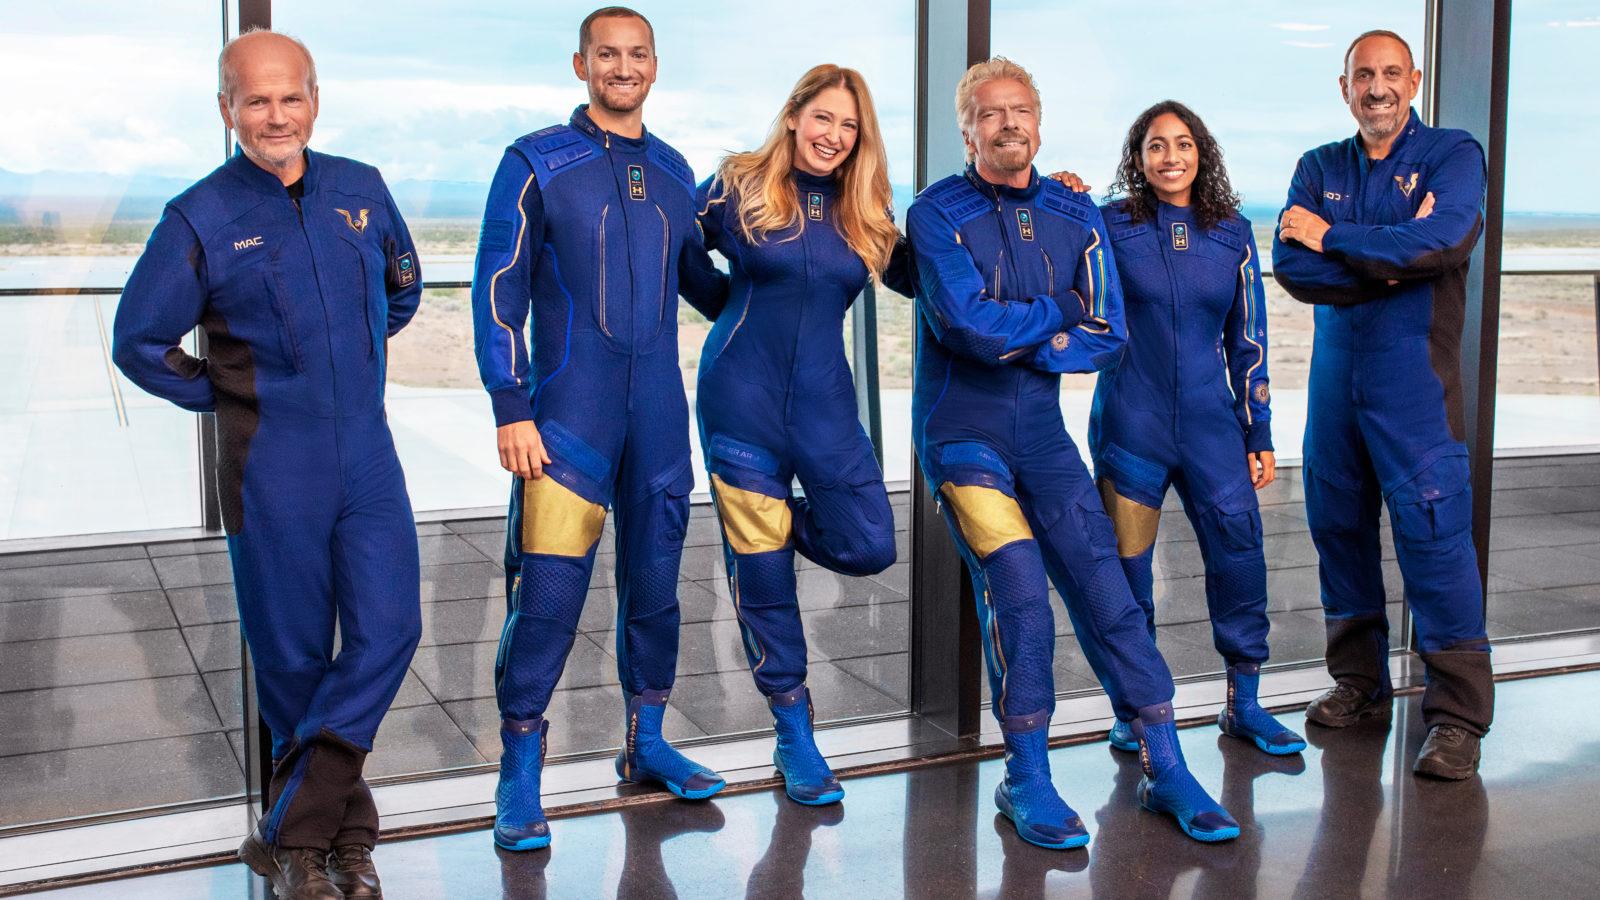 Da sinistra, il pilota Dave Mackay, Colin Bennett, Beth Moses, Richard Branson, Sirisha Bandla e il pilota Michael Masucci. Credits: Virgin Galactic.